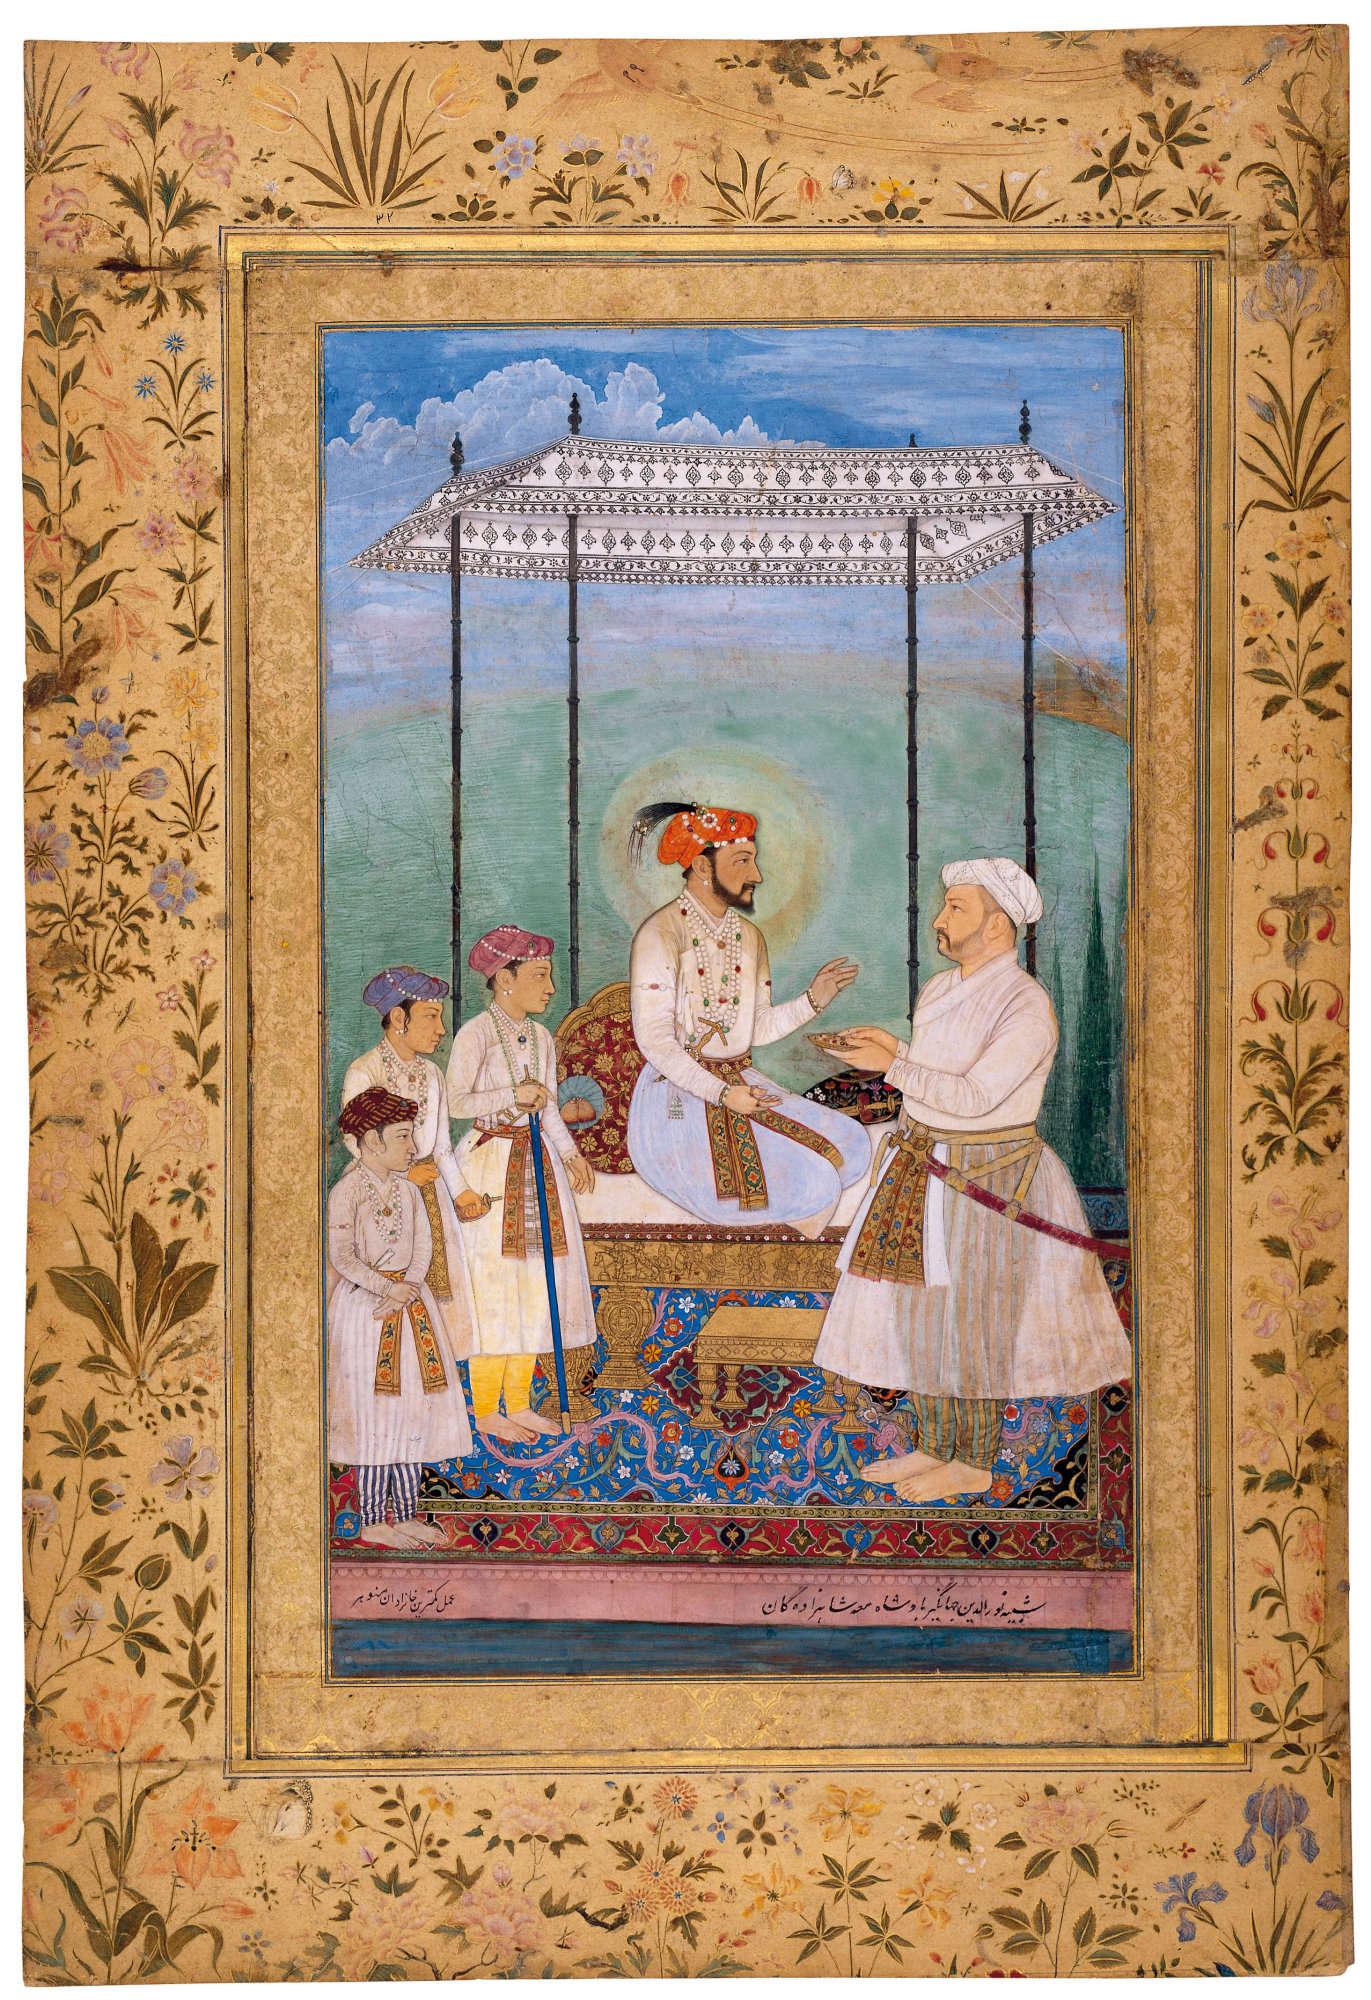 File:Emperor Shah Jahan, 1628.jpg